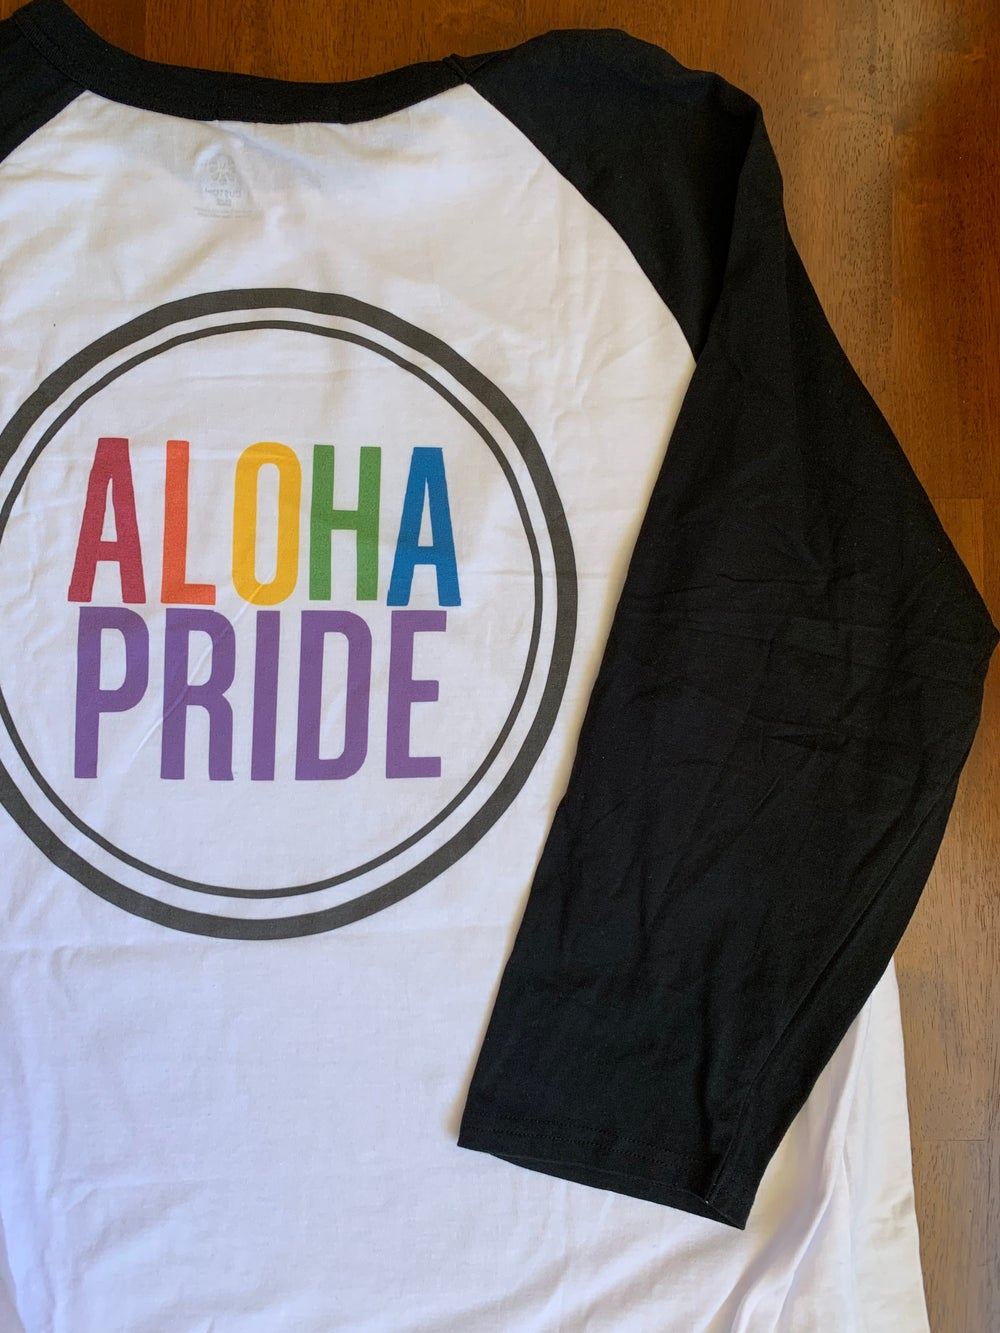 Aloha Pride (2019 Exclusive)